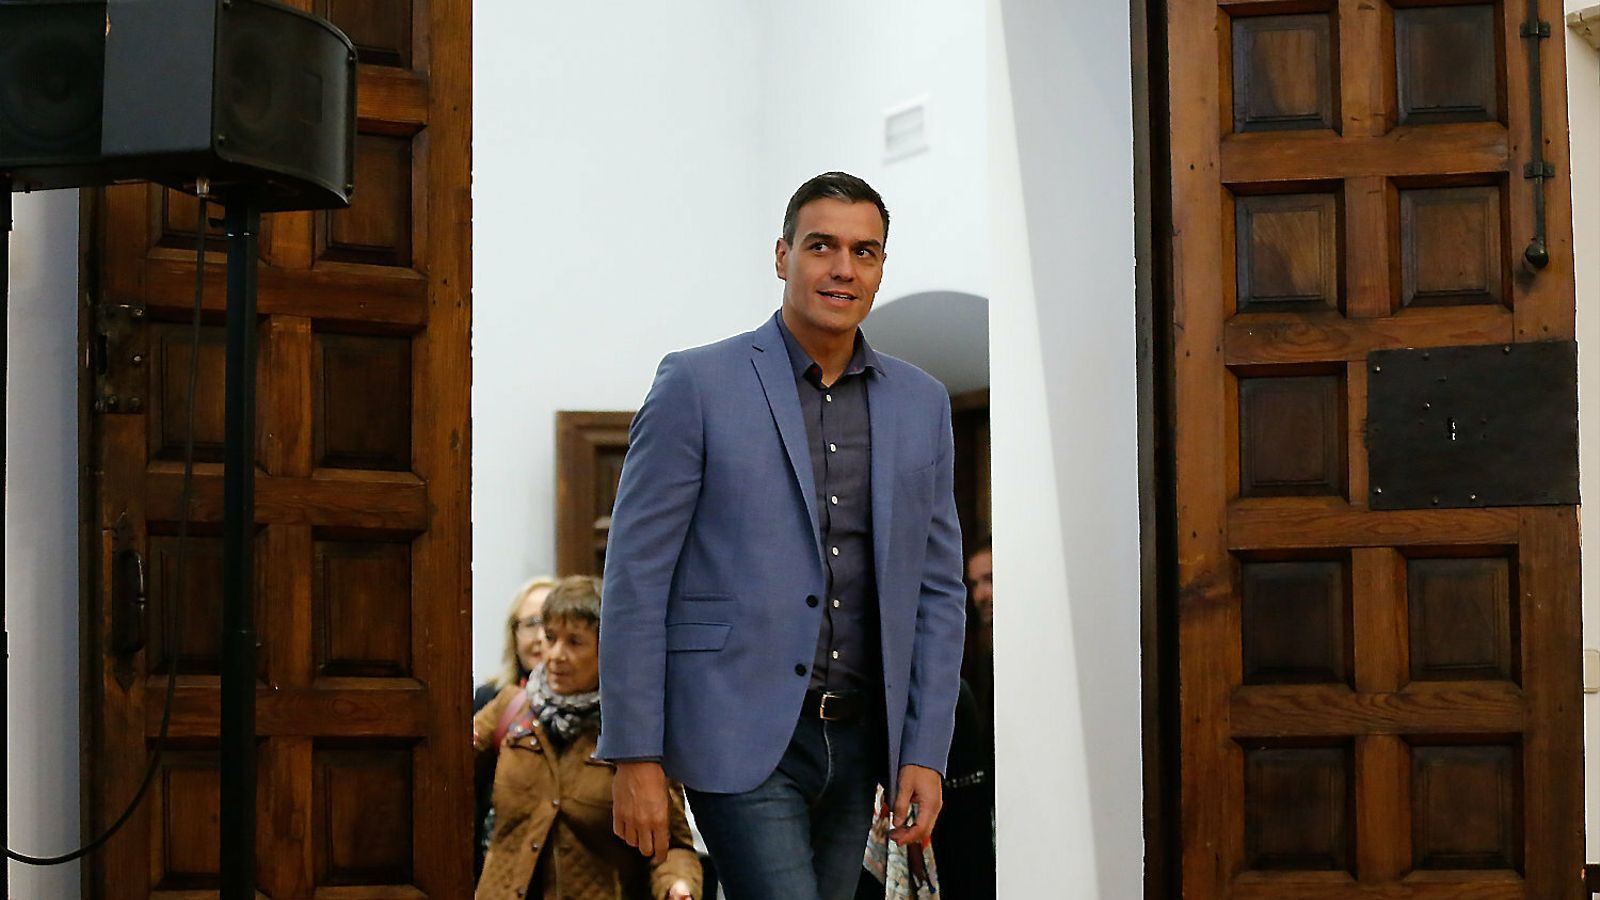 El president del govern espanyol en funcions i líder del PSOE, Pedro Sánchez, ahir en un acte preelectoral a Salamanca.